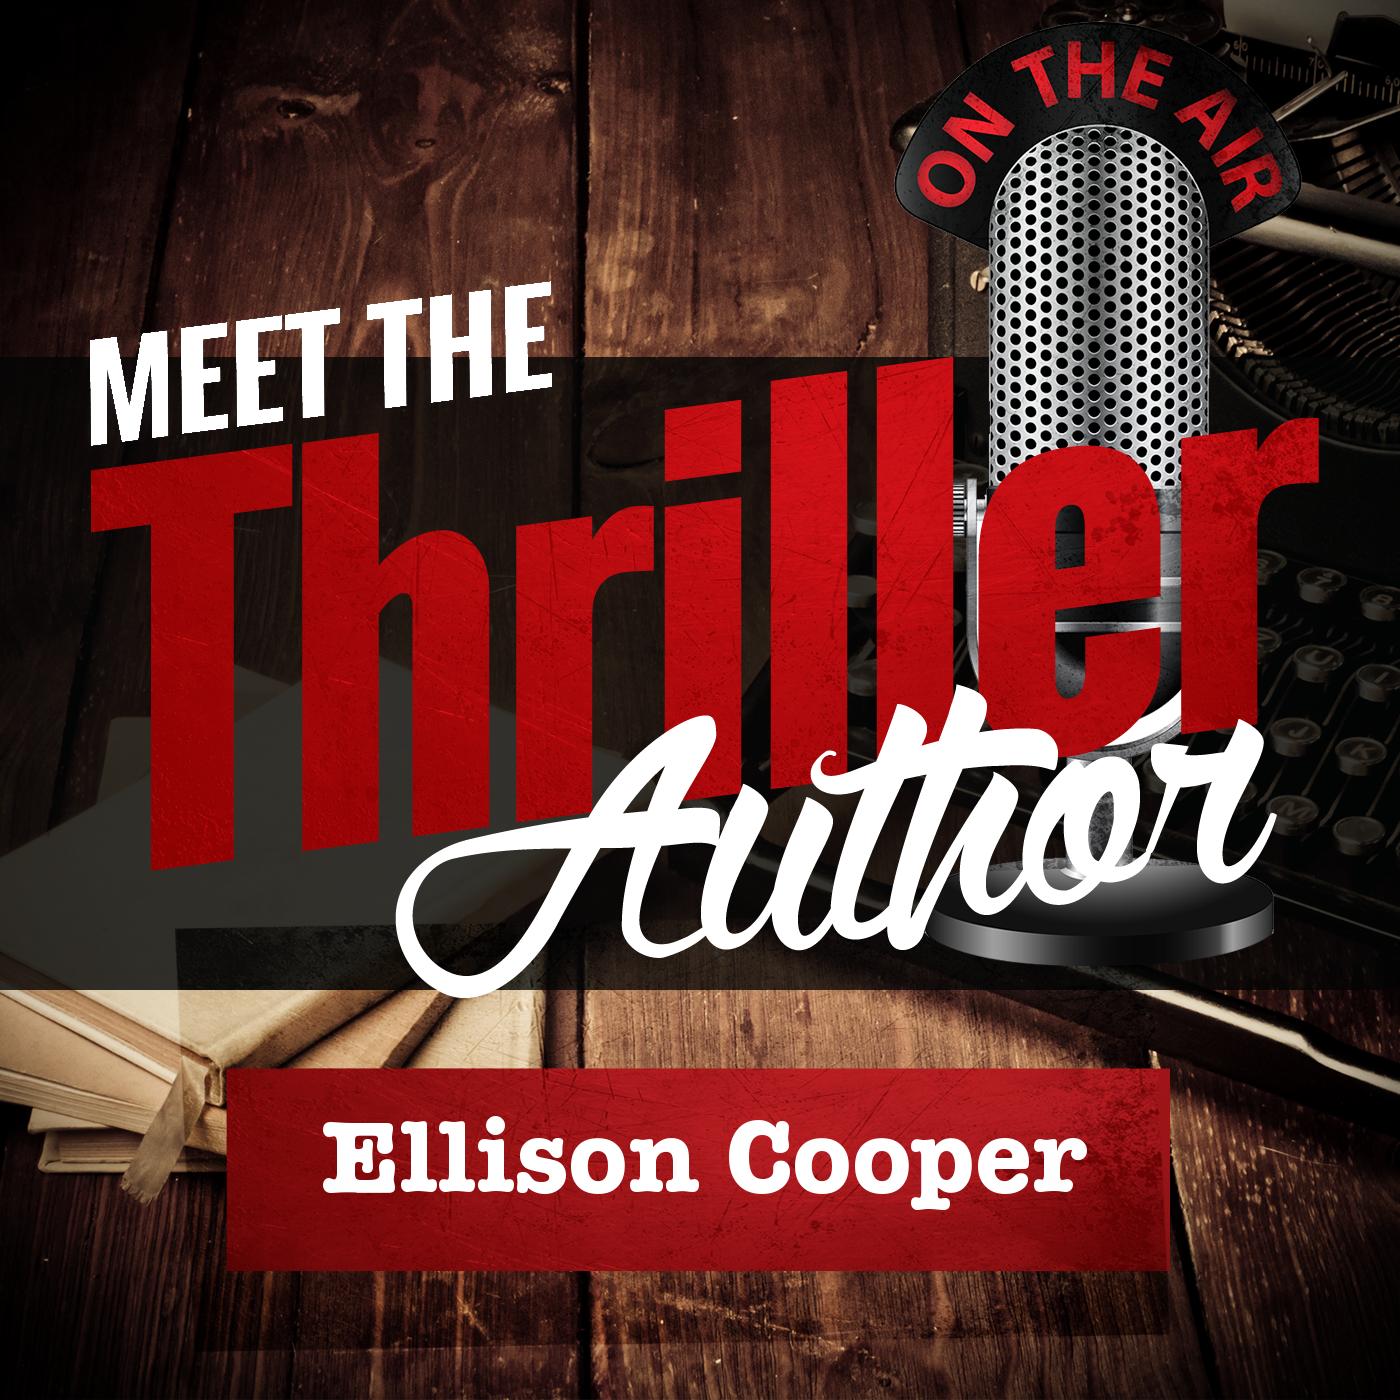 Meet the Thriller Author: Ellison Cooper